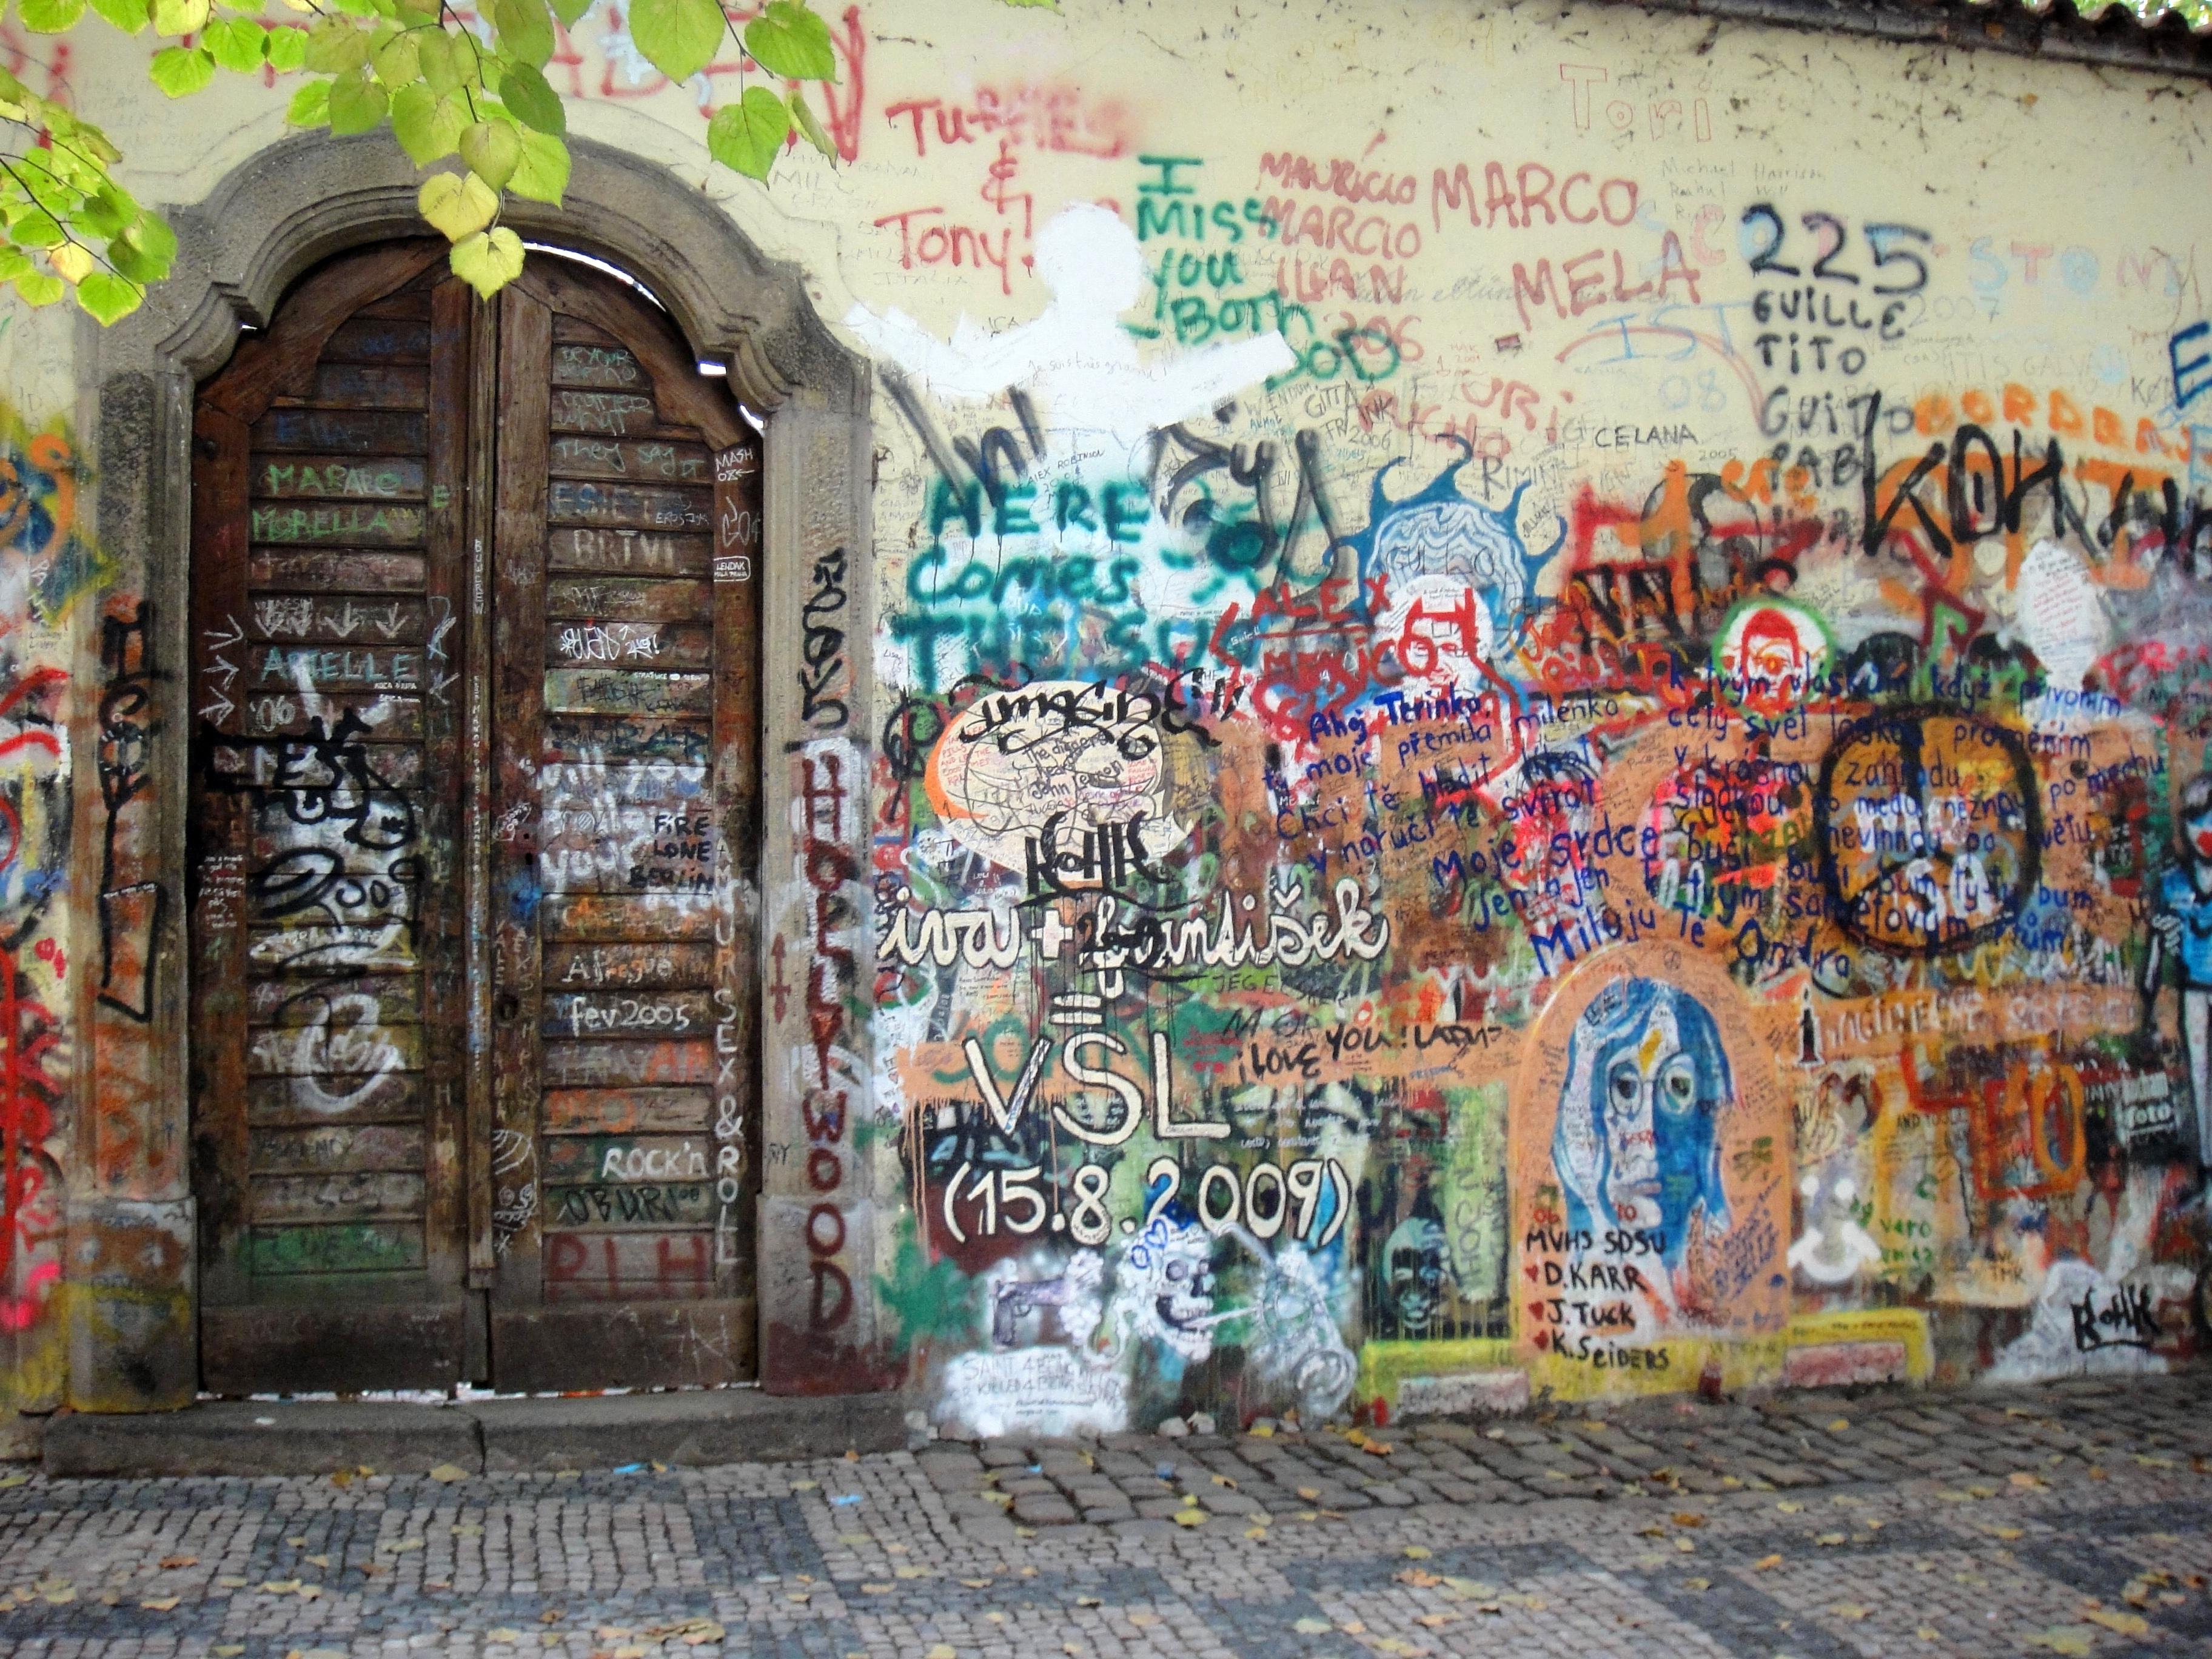 free images road peace prague colorful graffiti